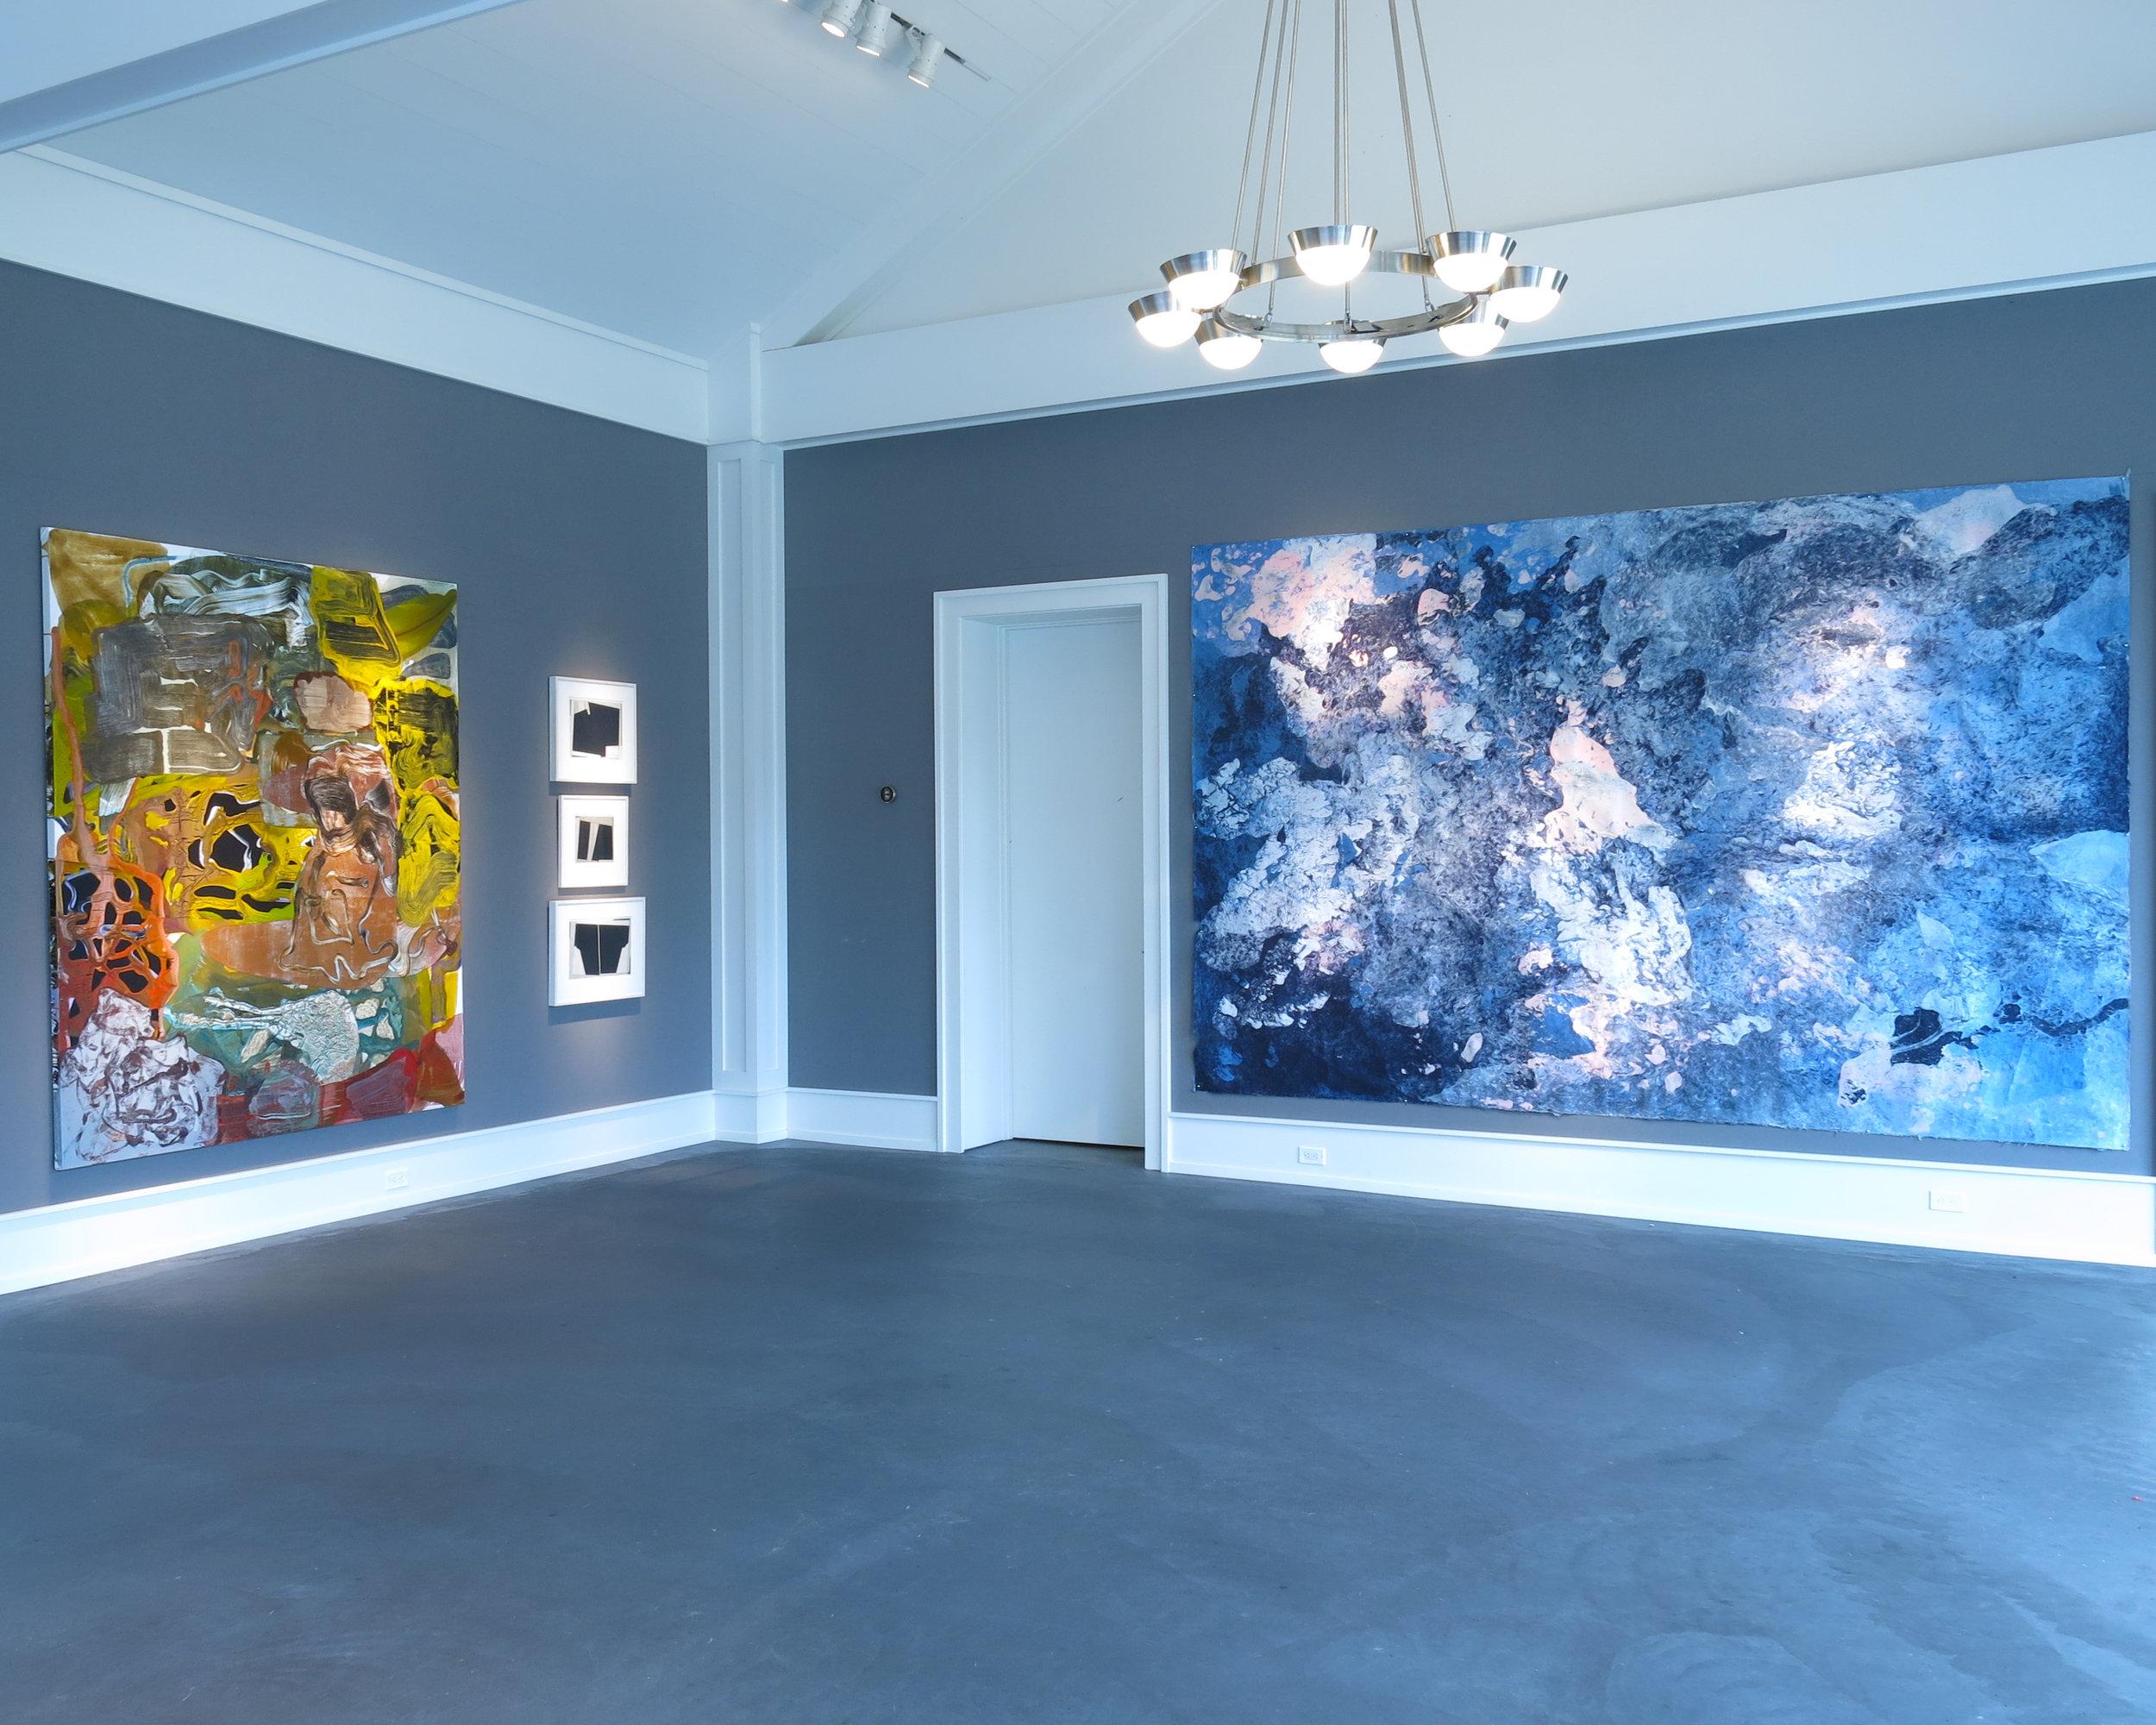 Zachary Keeting, John Willis, and Hong Hong in the Judy Black Memorial Space